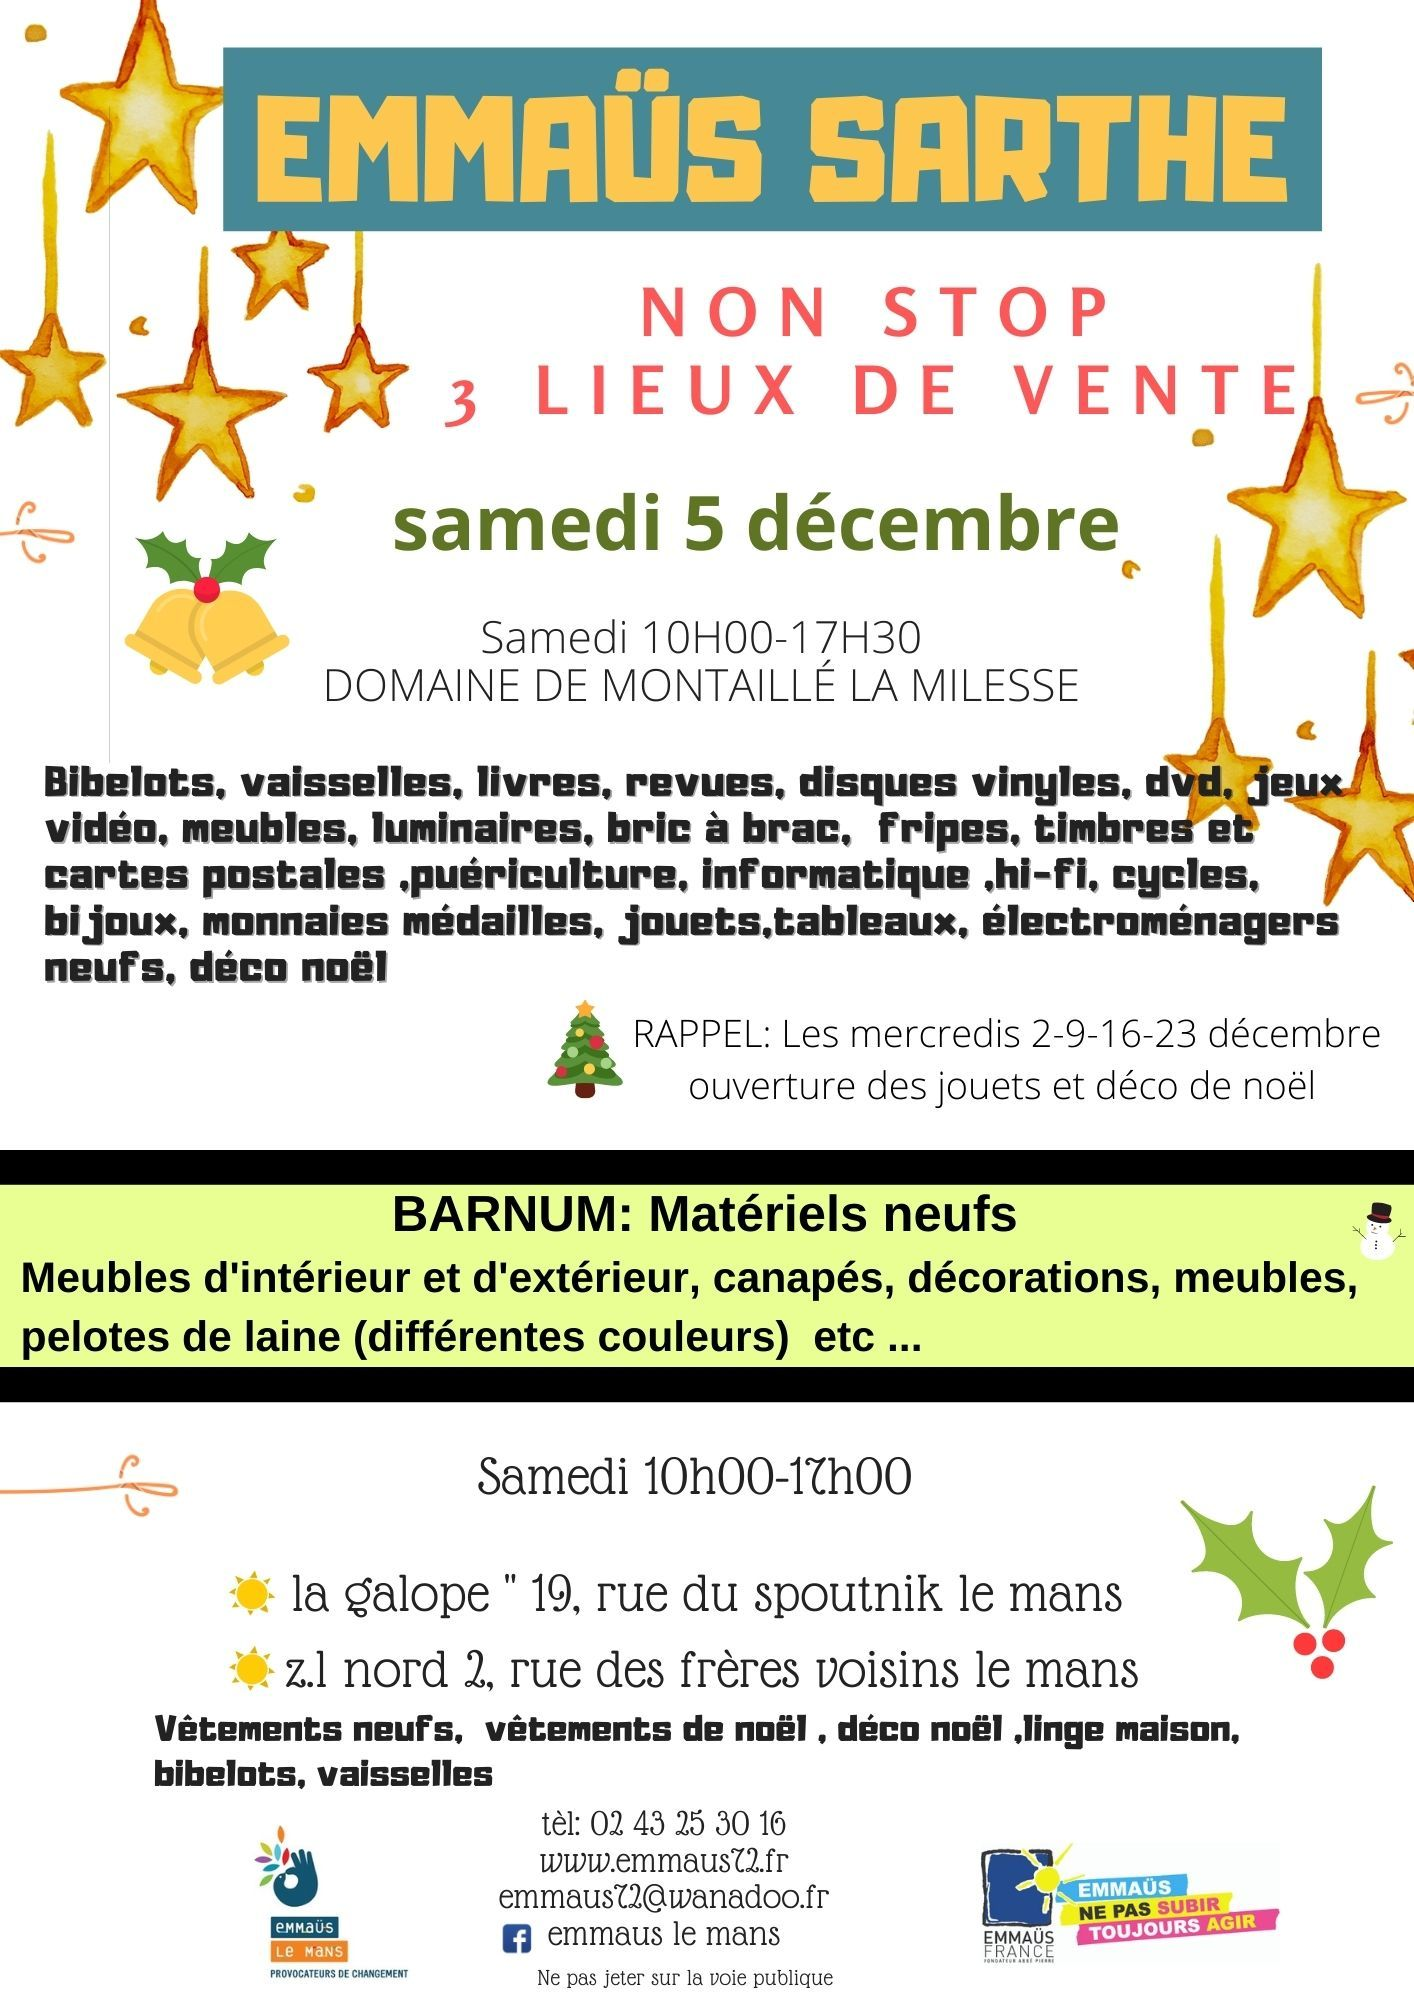 Emmaüs-Sarthe, vente de décembre